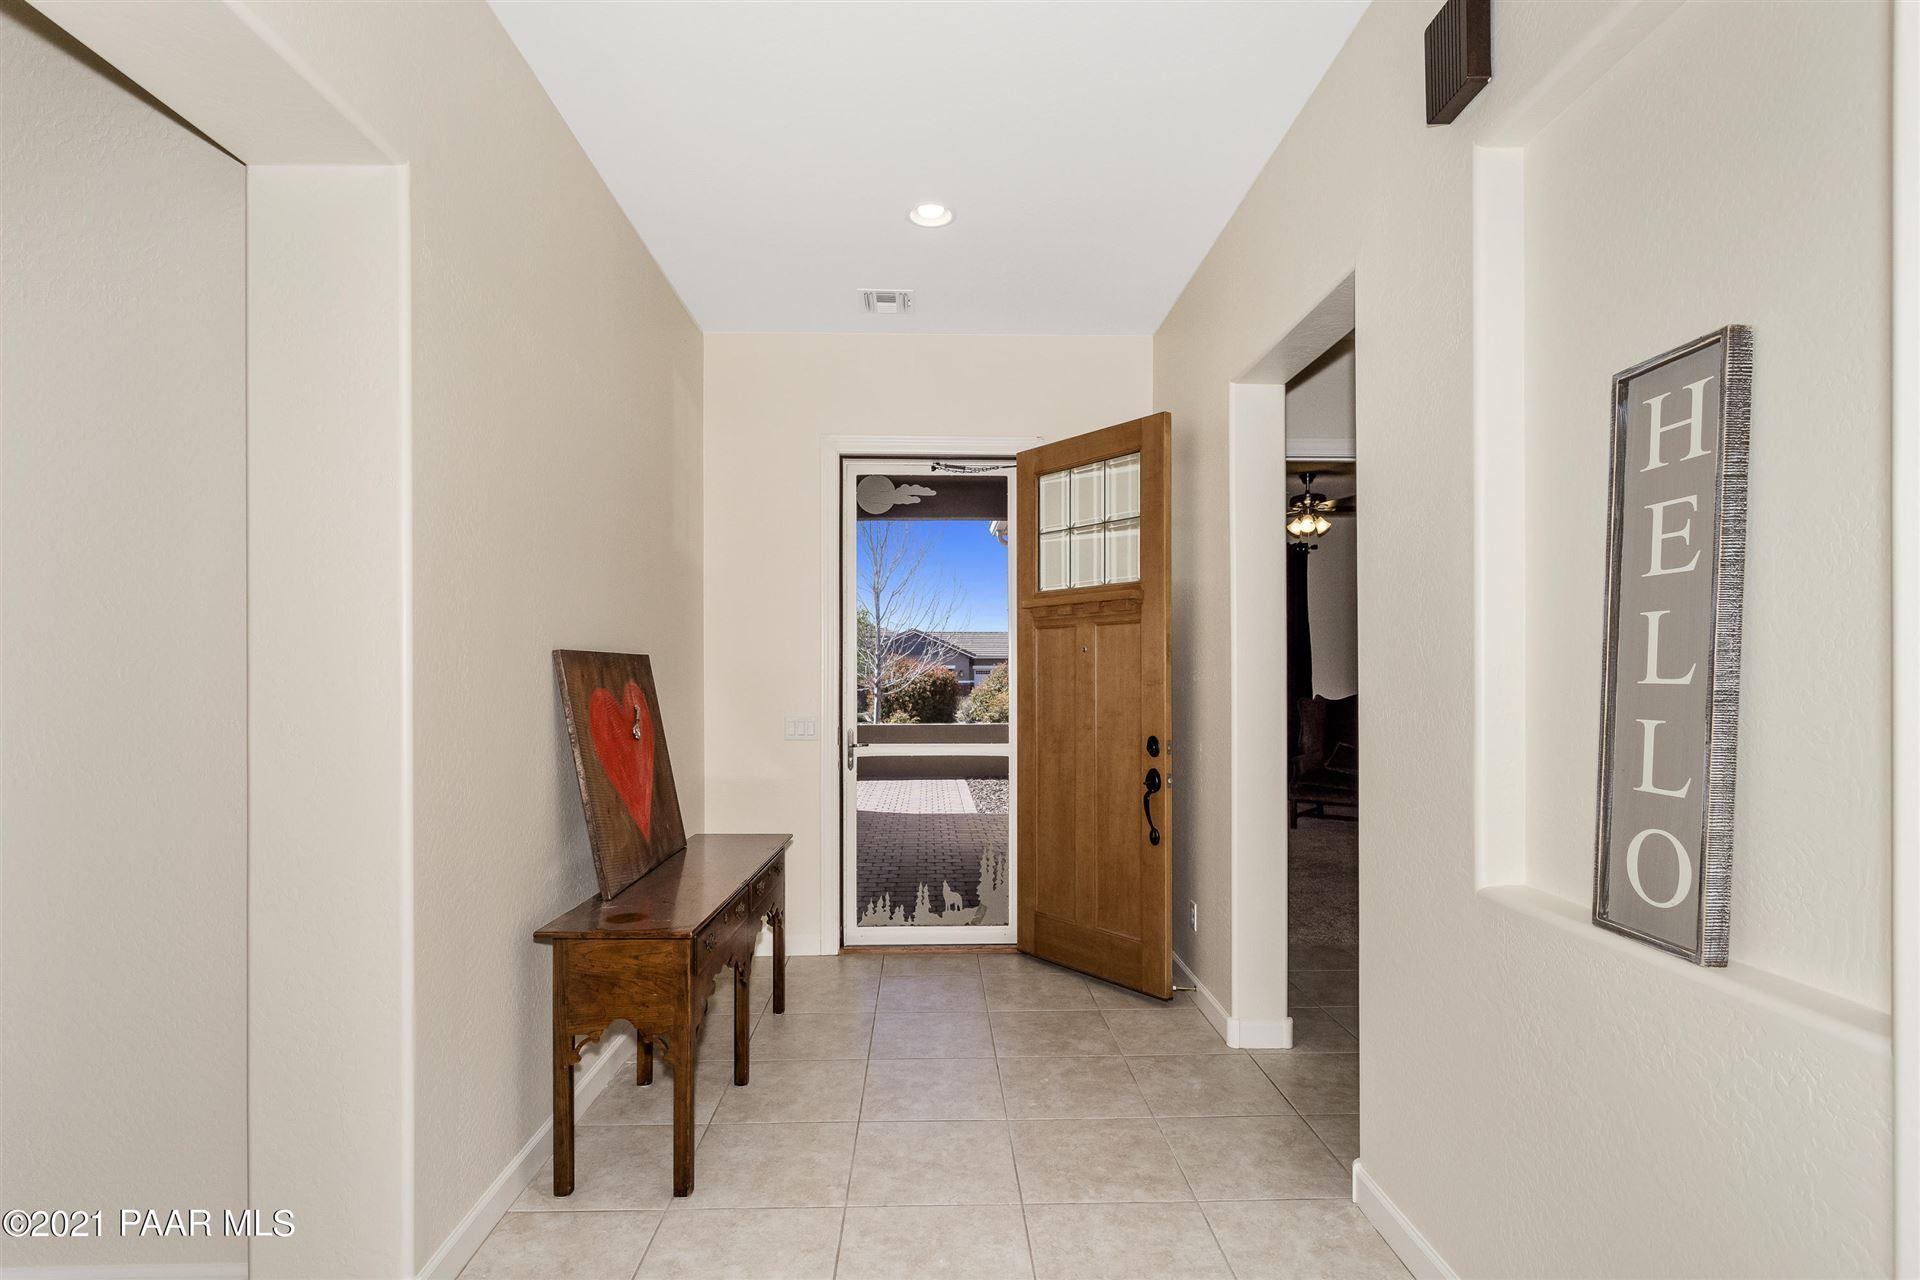 Photo of 1352 Divinity Drive #Lot: 102, Prescott, AZ 86301 (MLS # 1037589)